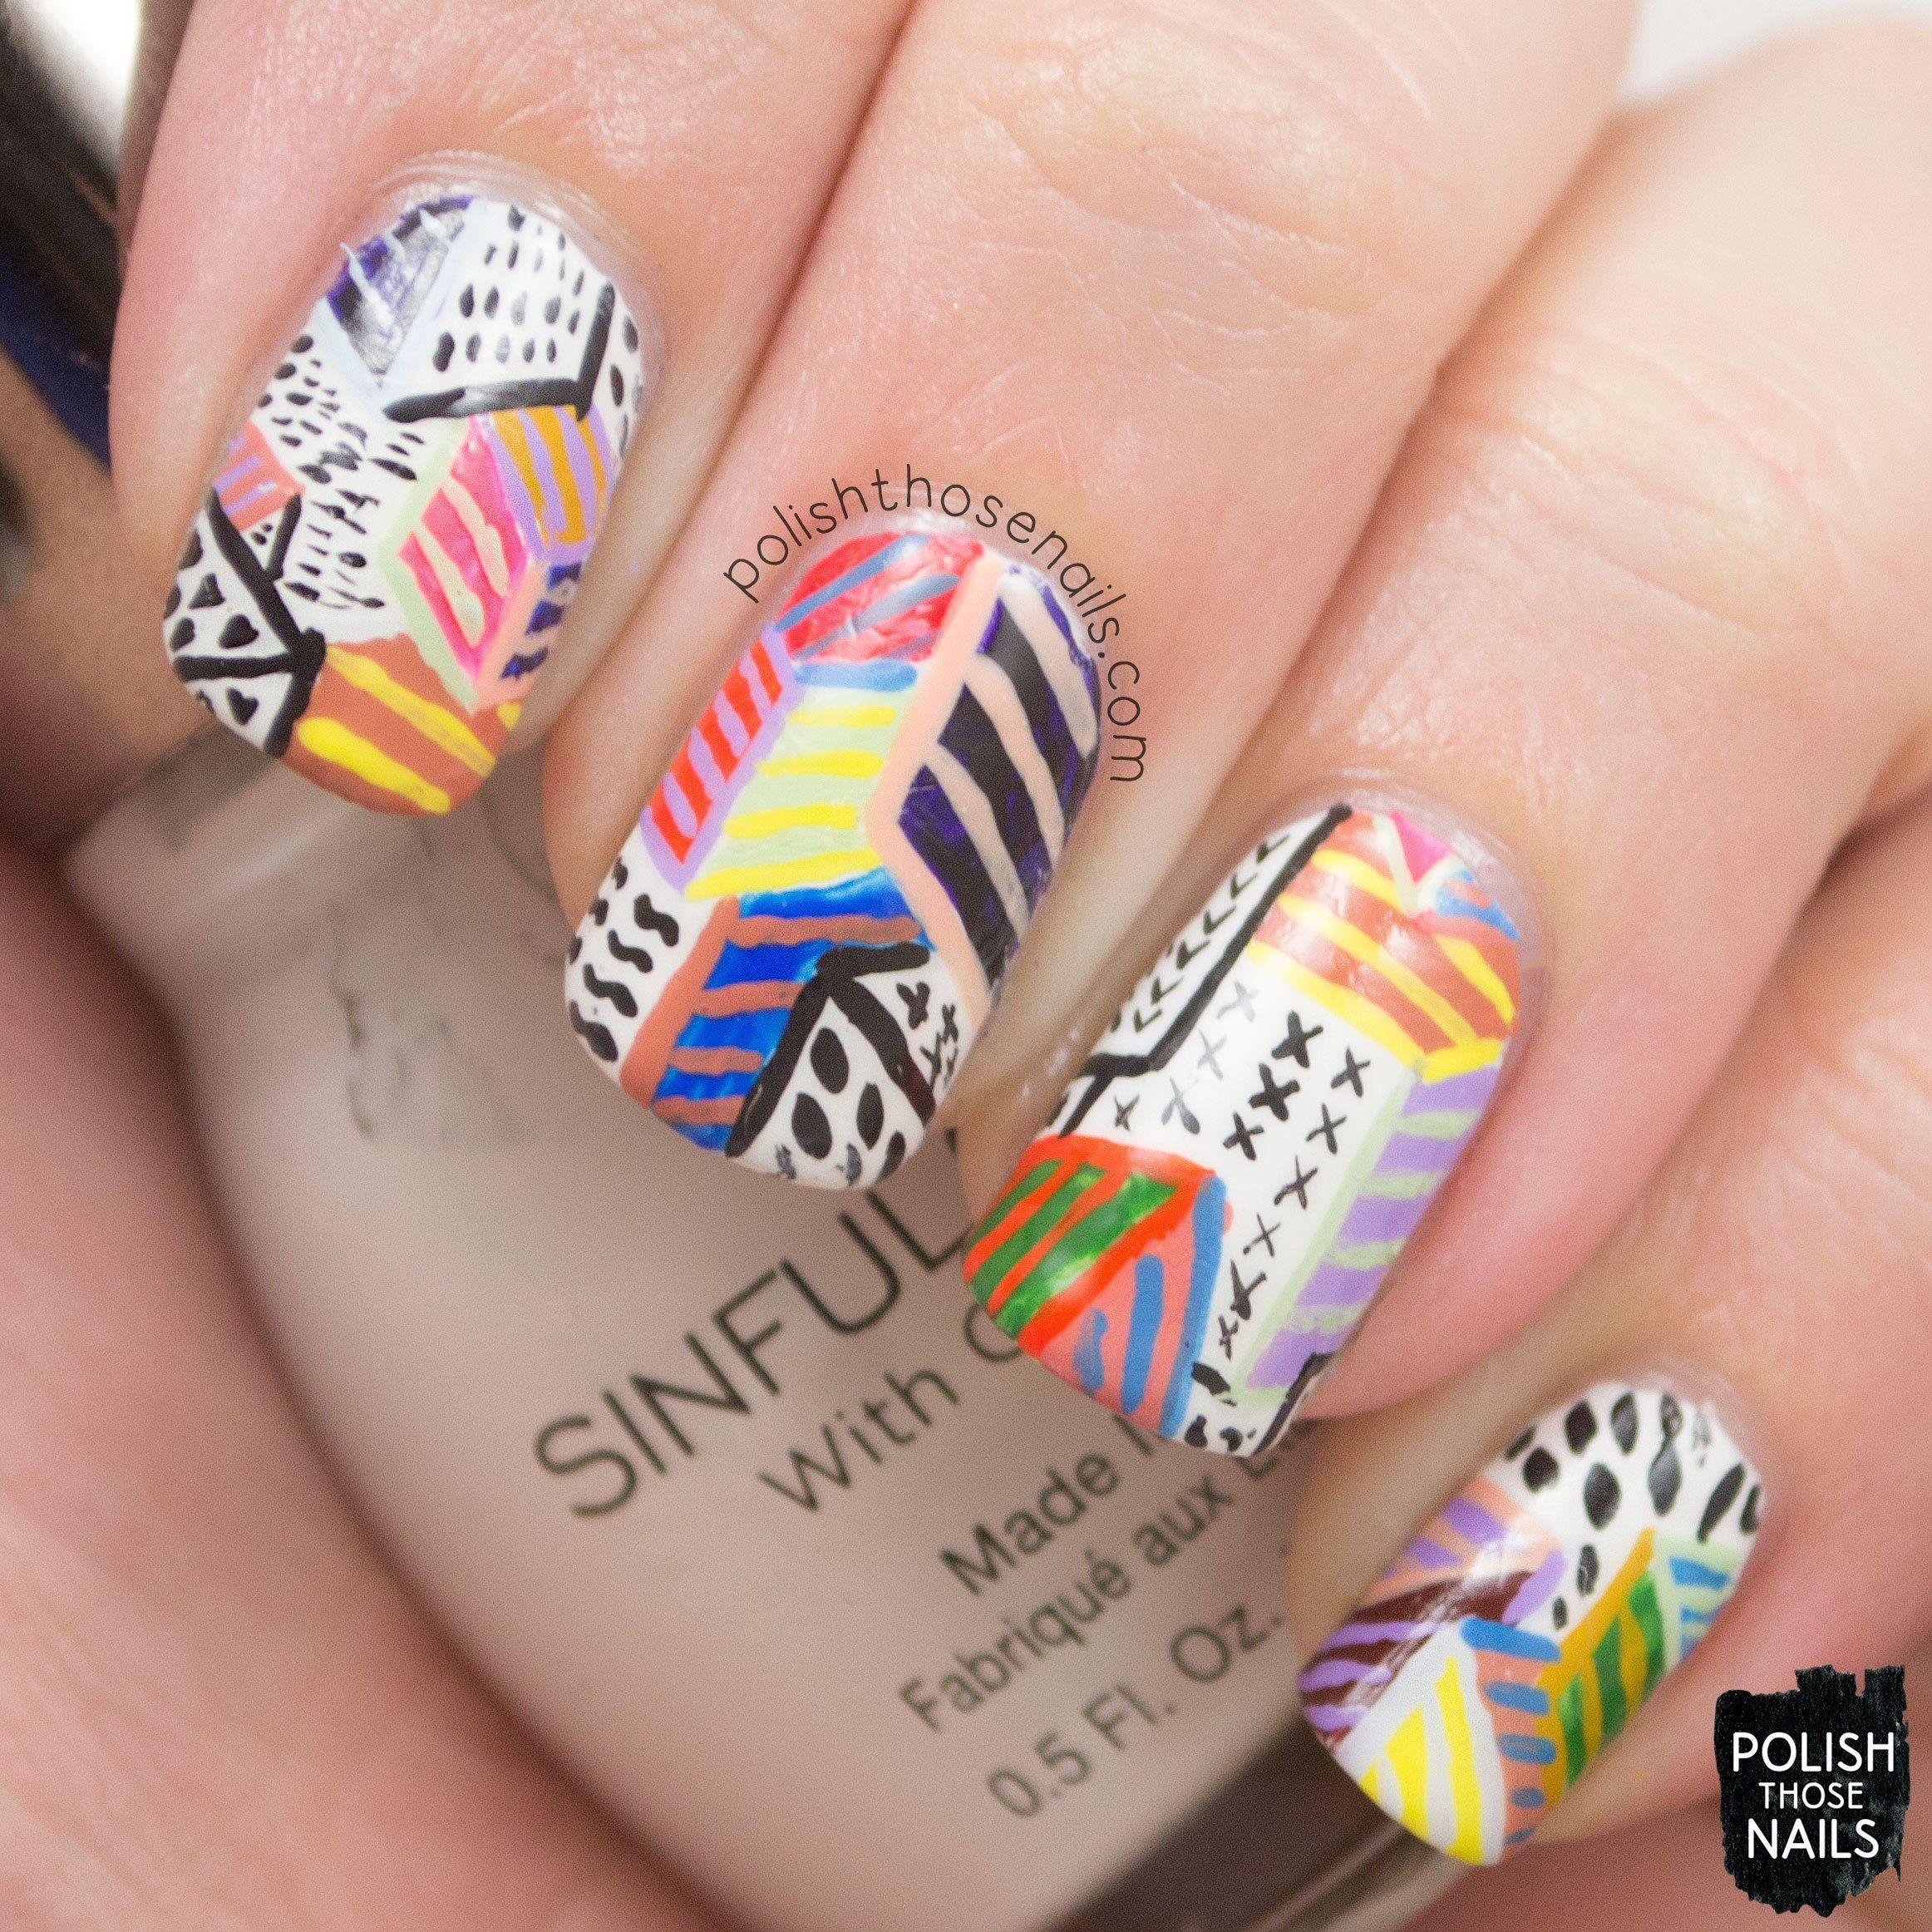 Polish those nails 40 great nail art ideas hobbies beauty polish those nails 40 great nail art ideas hobbies prinsesfo Choice Image